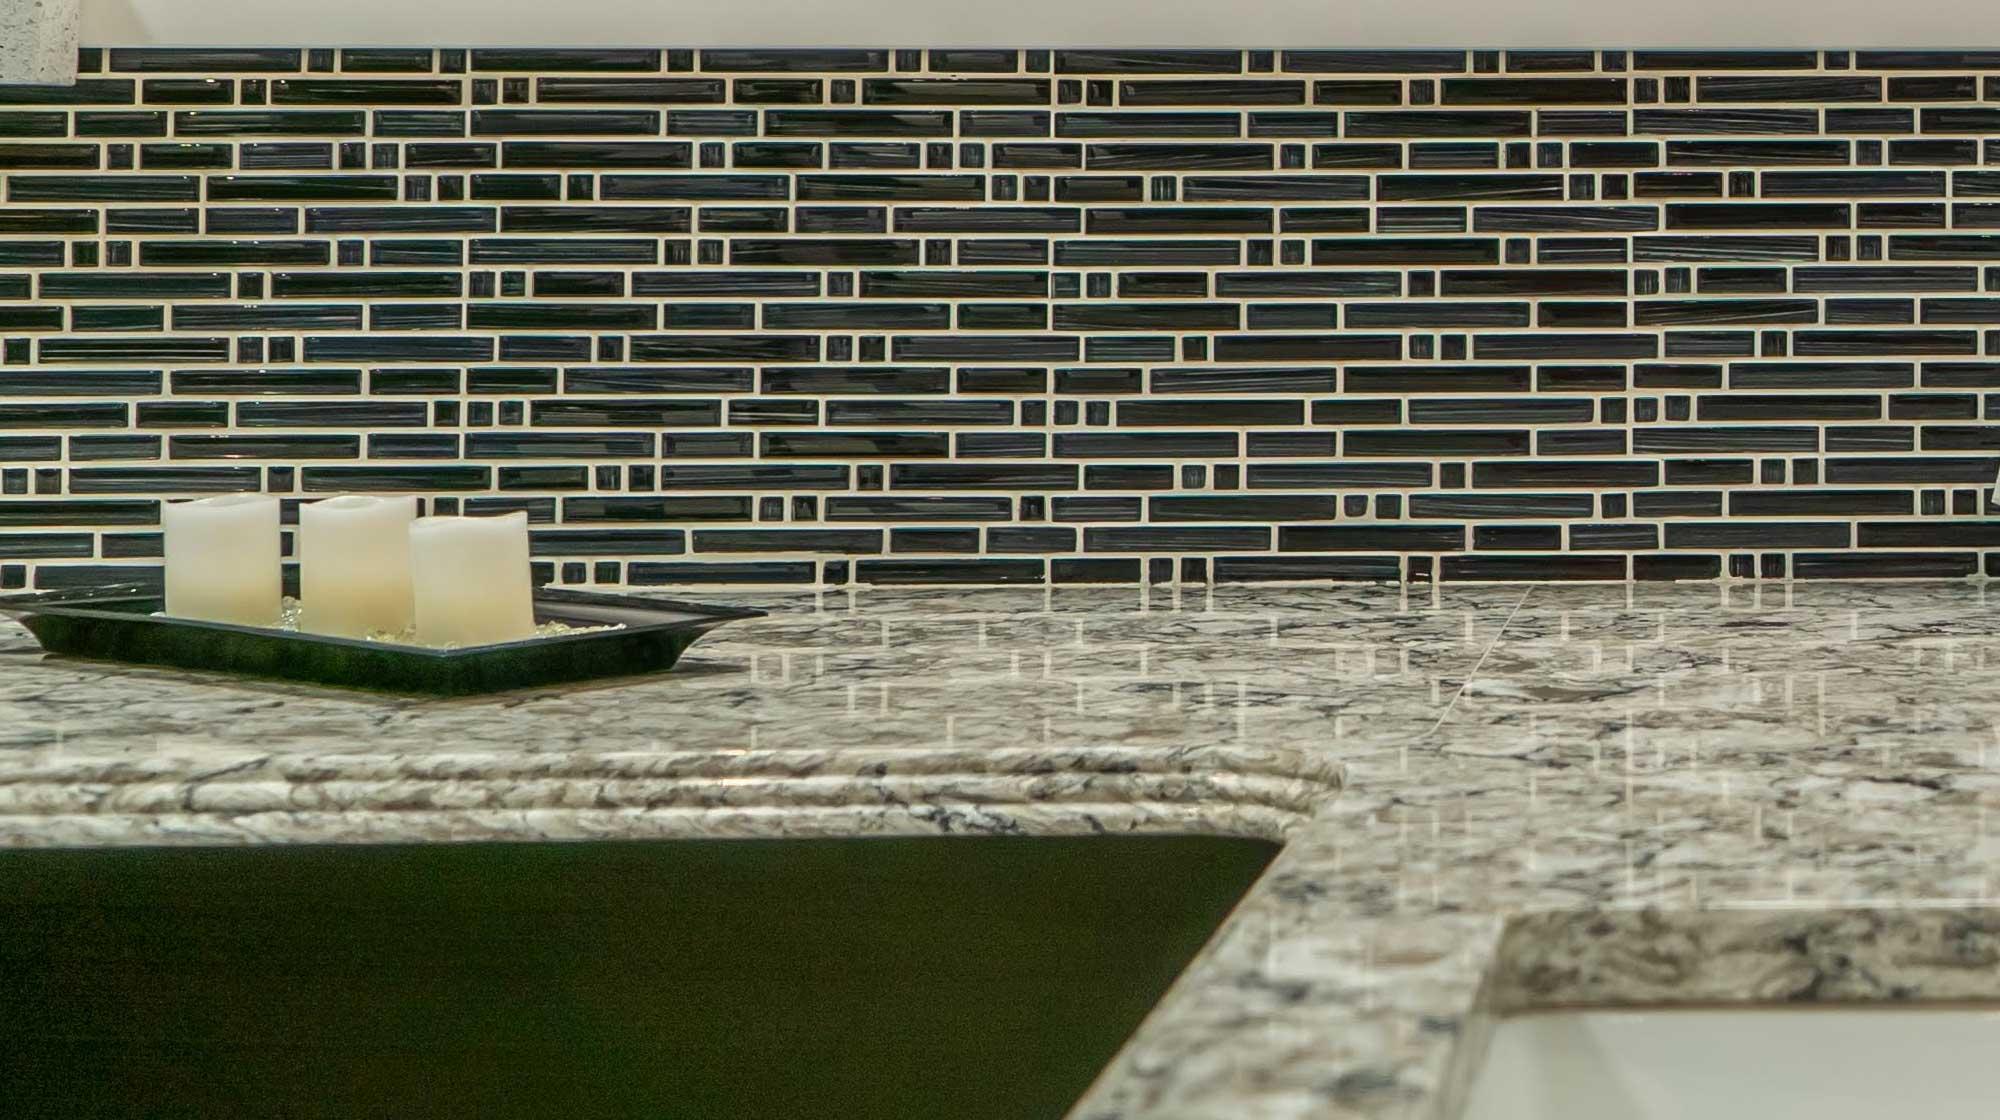 Choosing Your Kitchen Backsplashes Floform Countertops